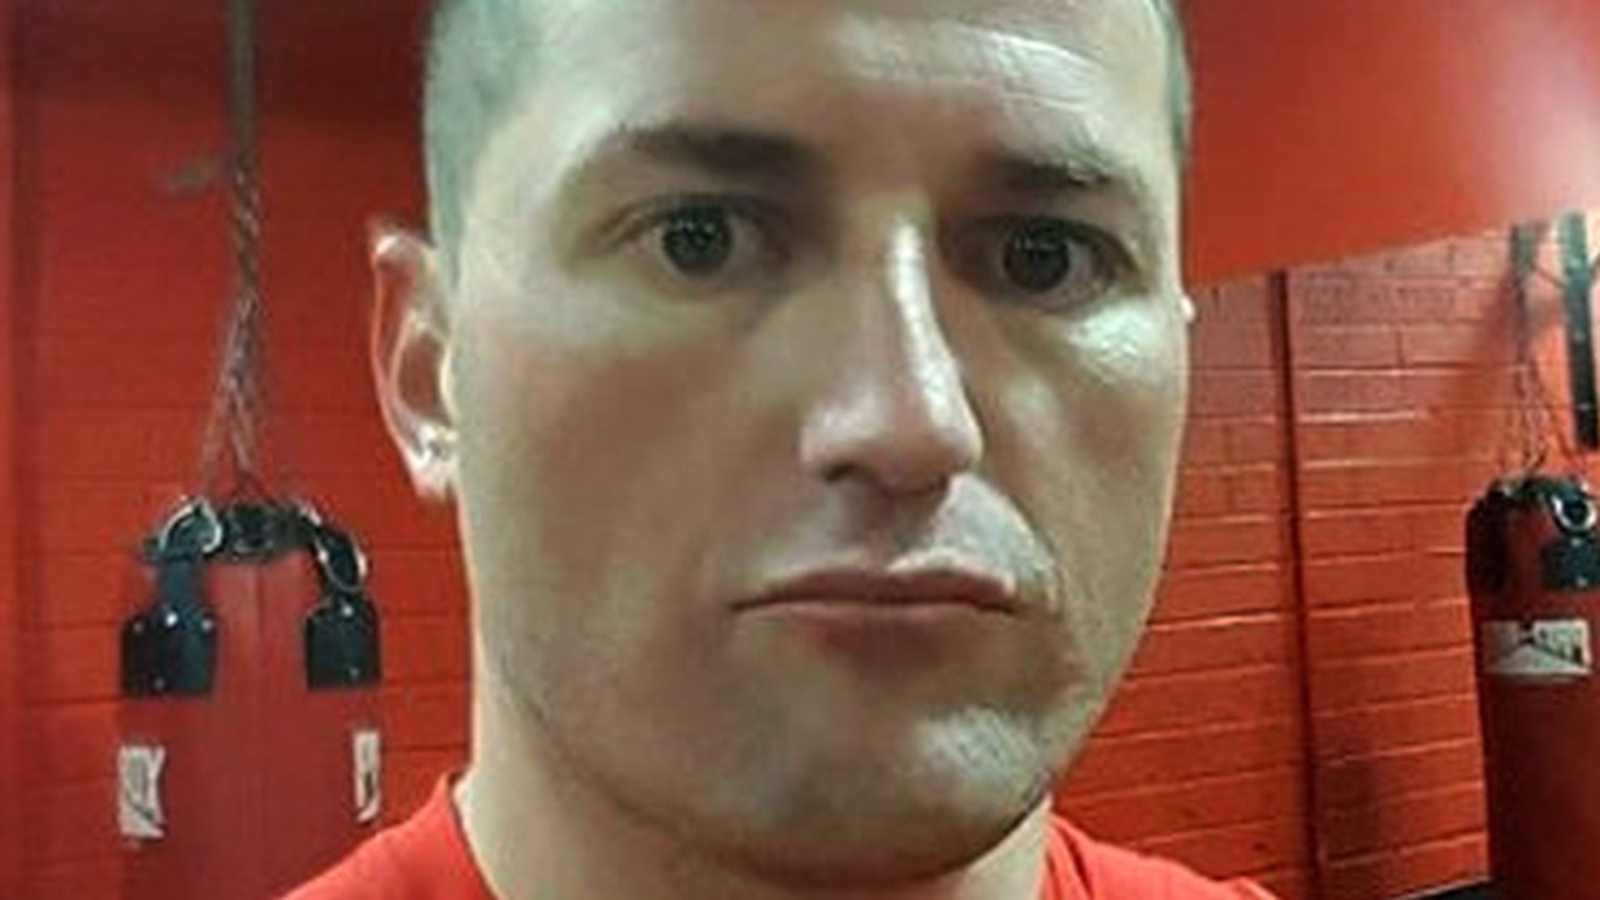 Man released in Lawlor Belfast murder investigation